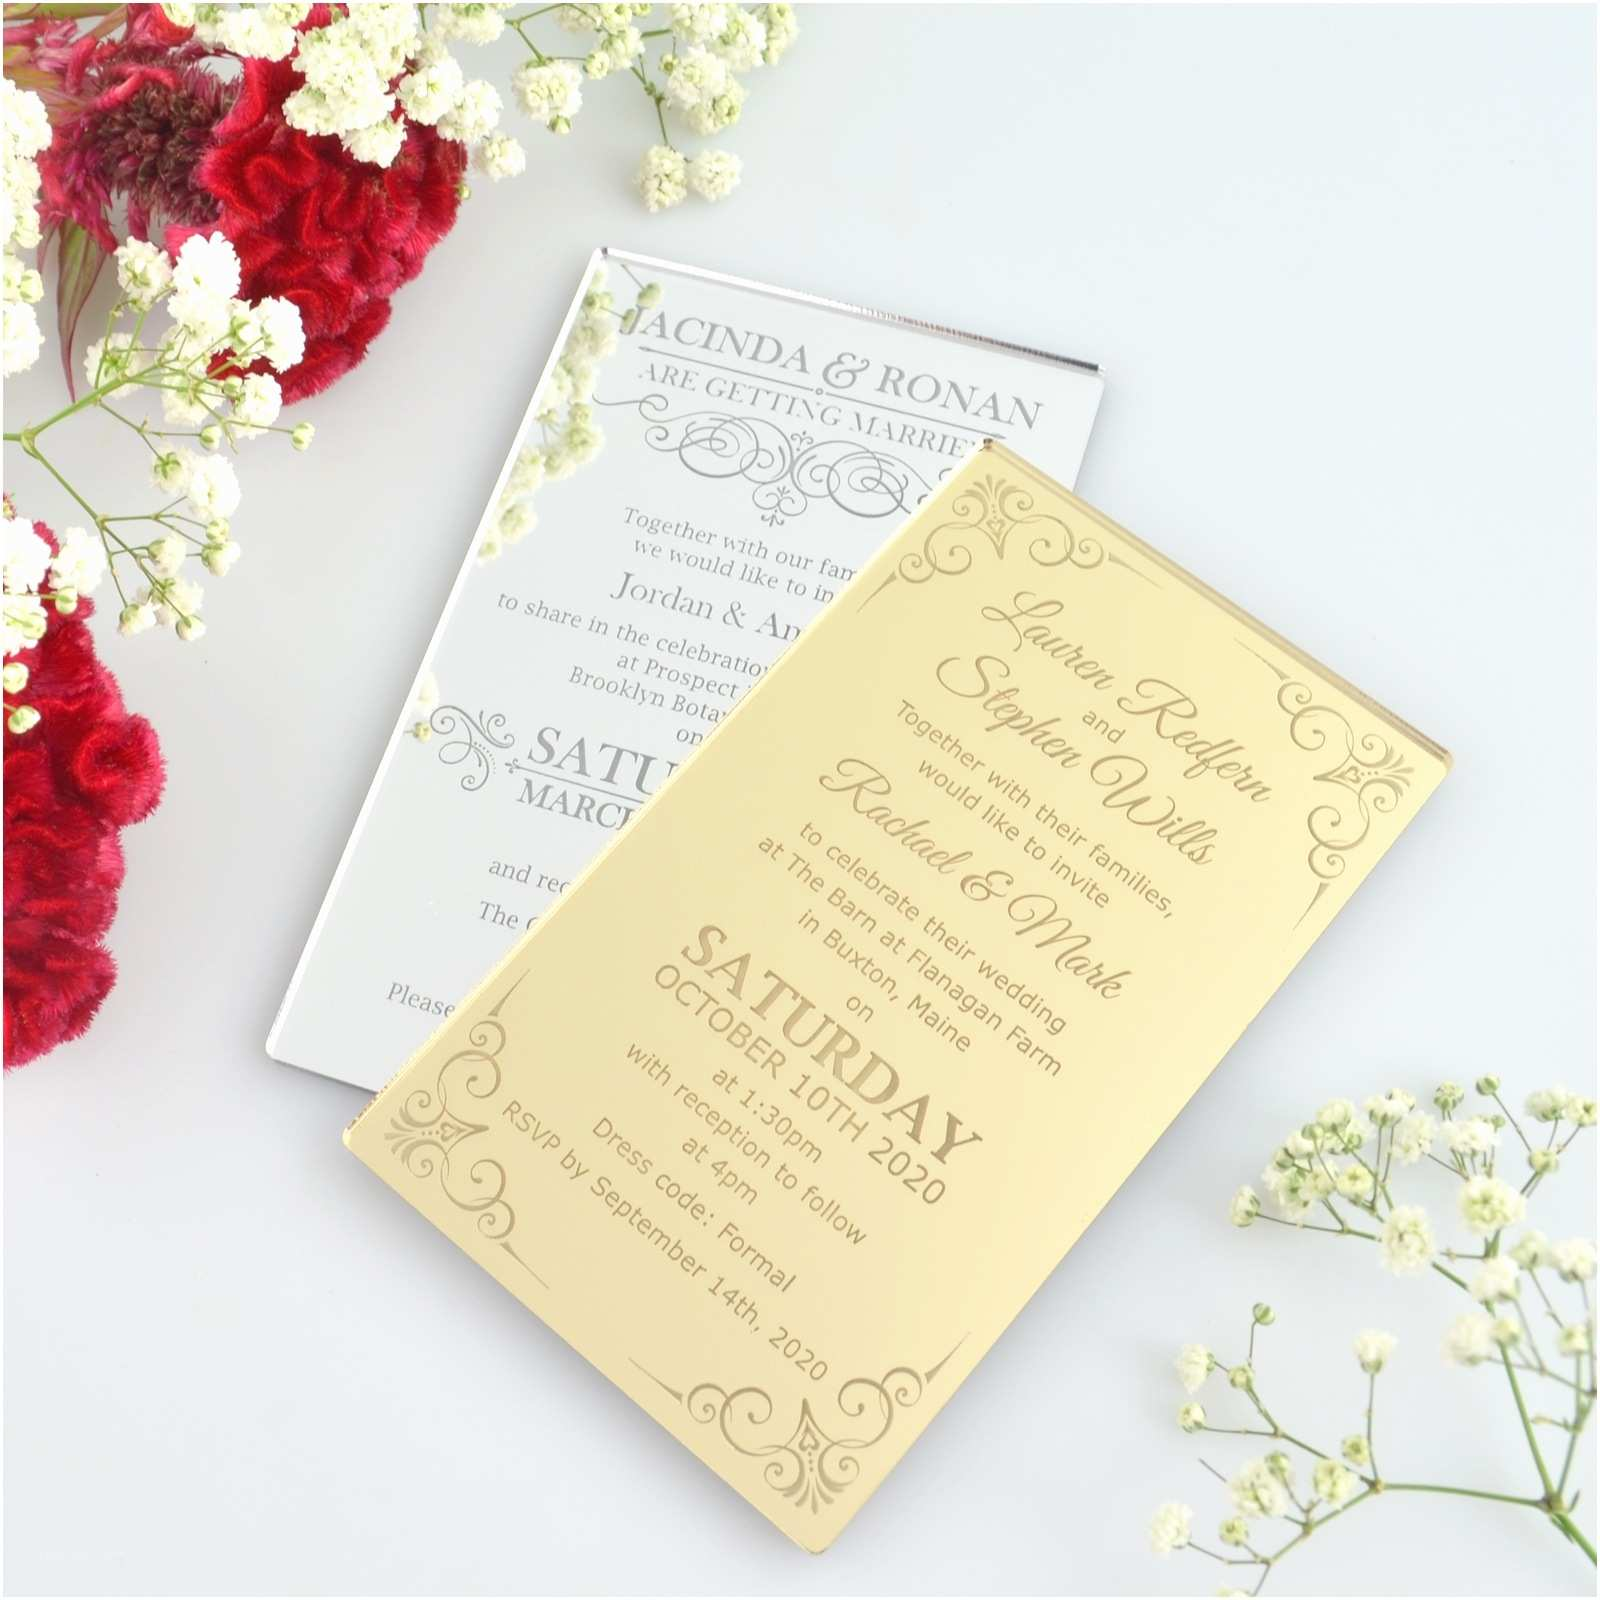 Acrylic Wedding Invitations Engraved Acrylic Wedding Invitation Gift and Mementos for